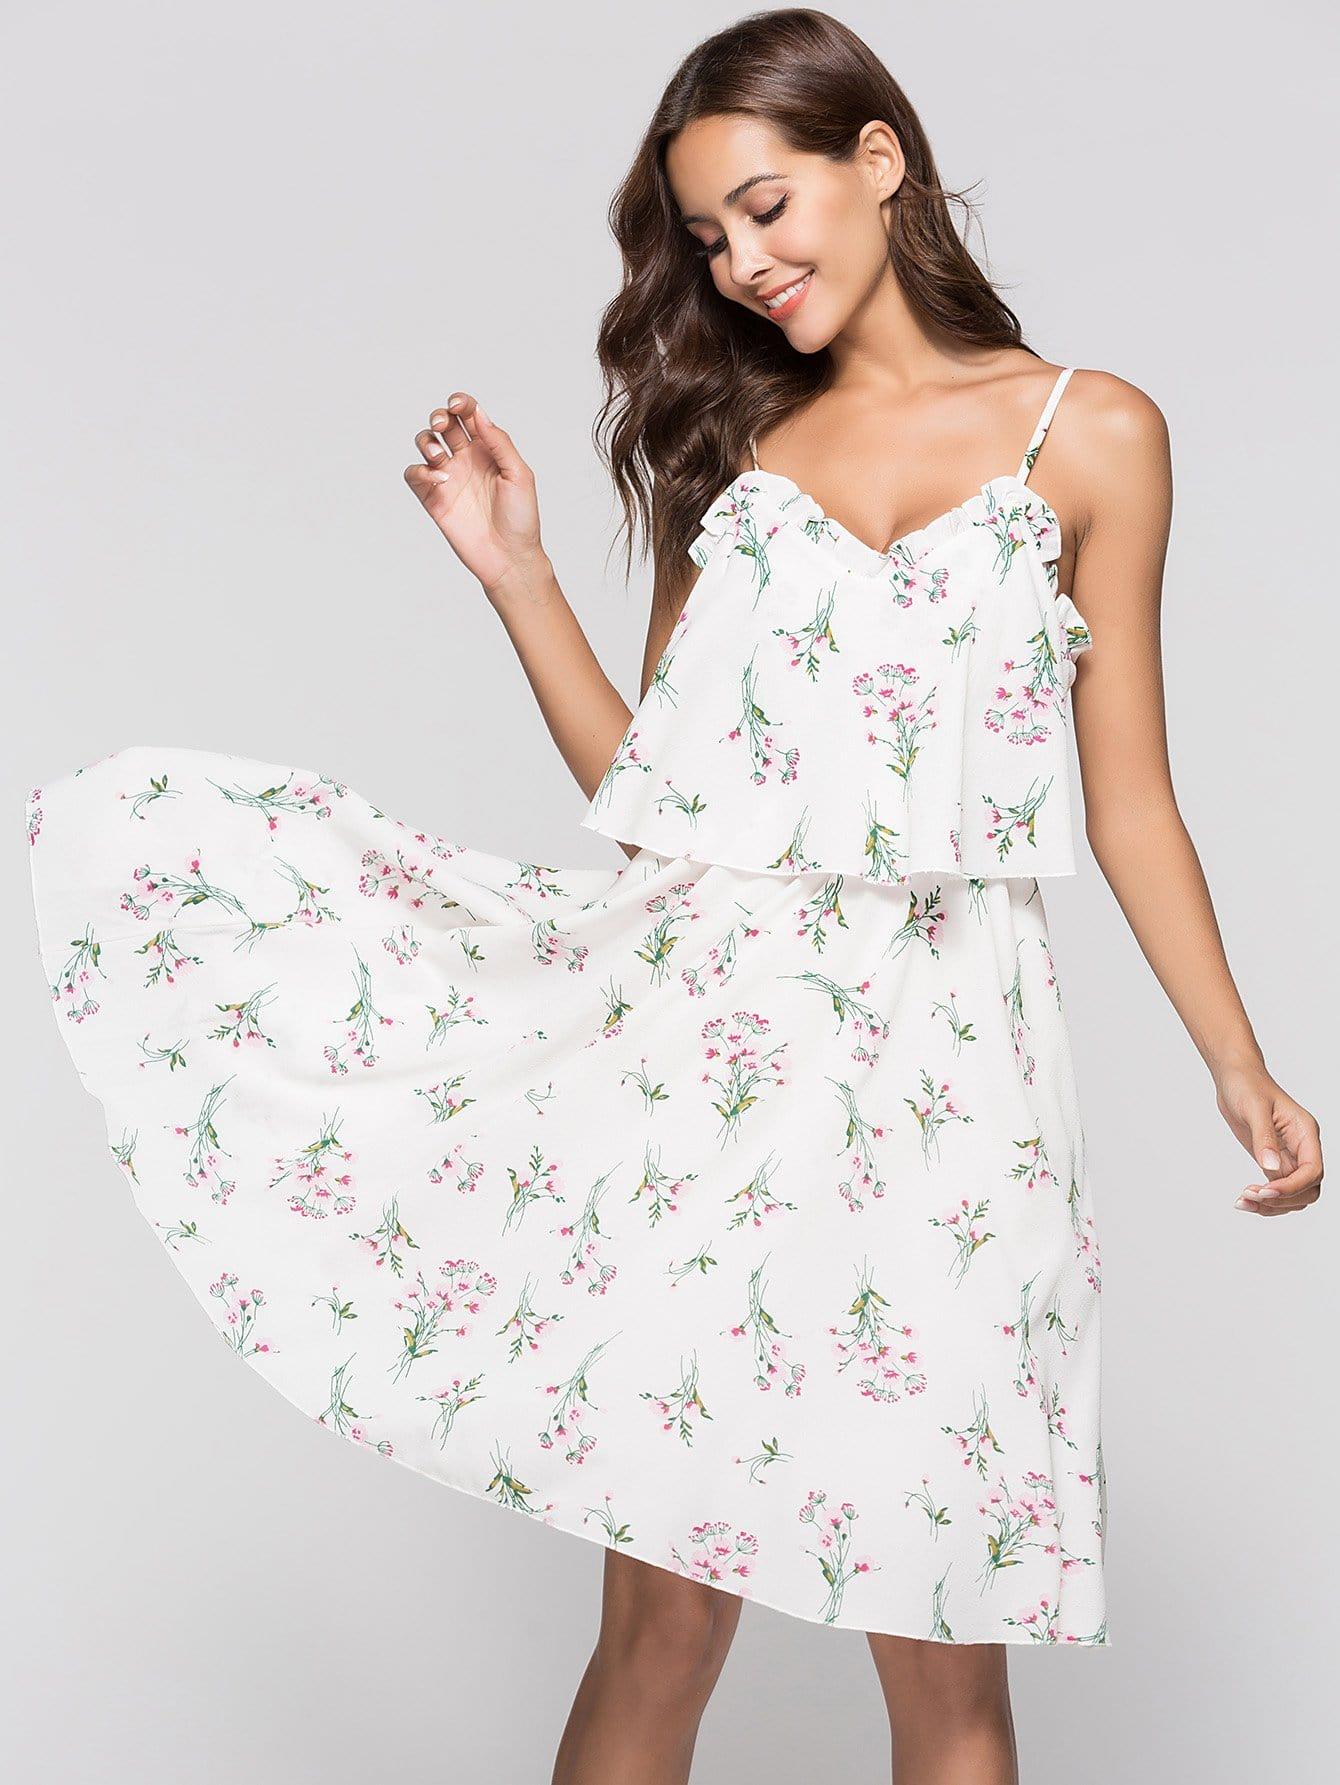 Floral Print Frill Trim Cami Dress girls floral embroidery frill trim dress